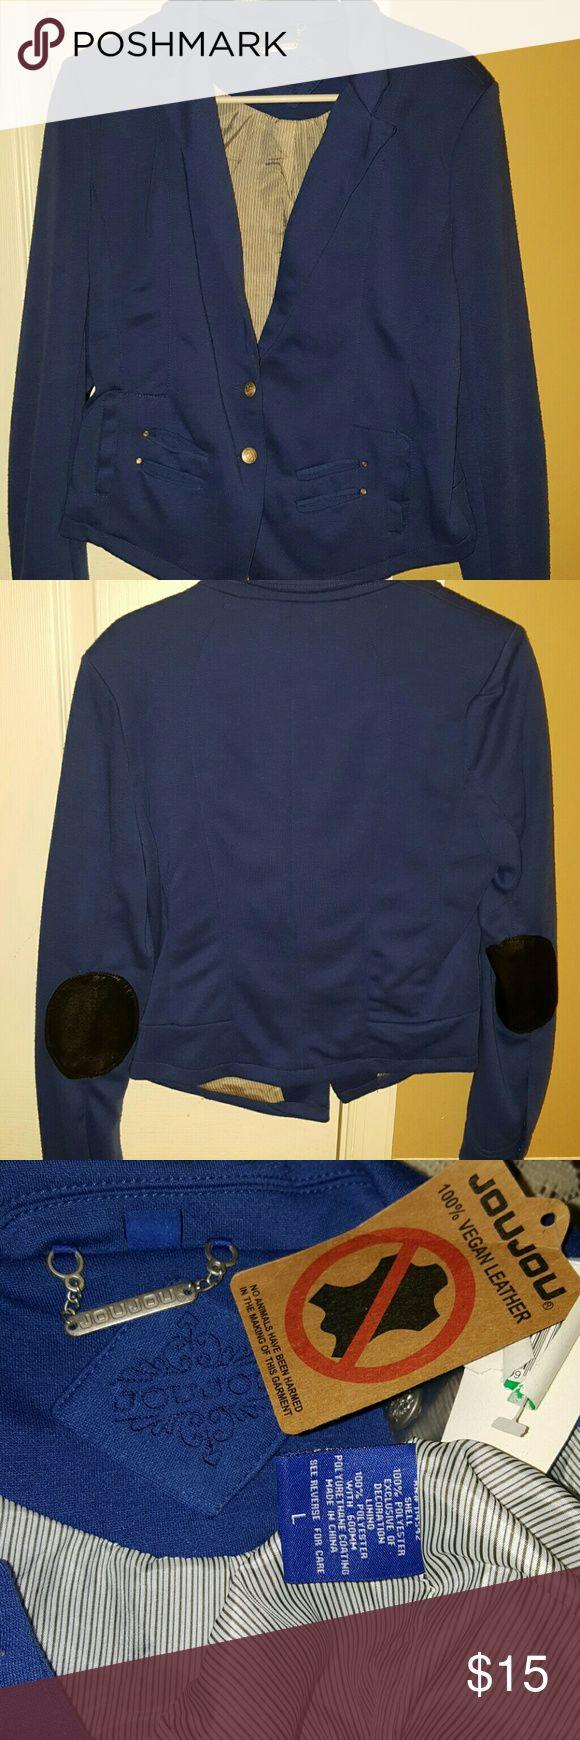 Precious royal blue jacket Royal blue jacket with 100% vegan leather patches on the elbows. Jou Jou Jackets & Coats Blazers